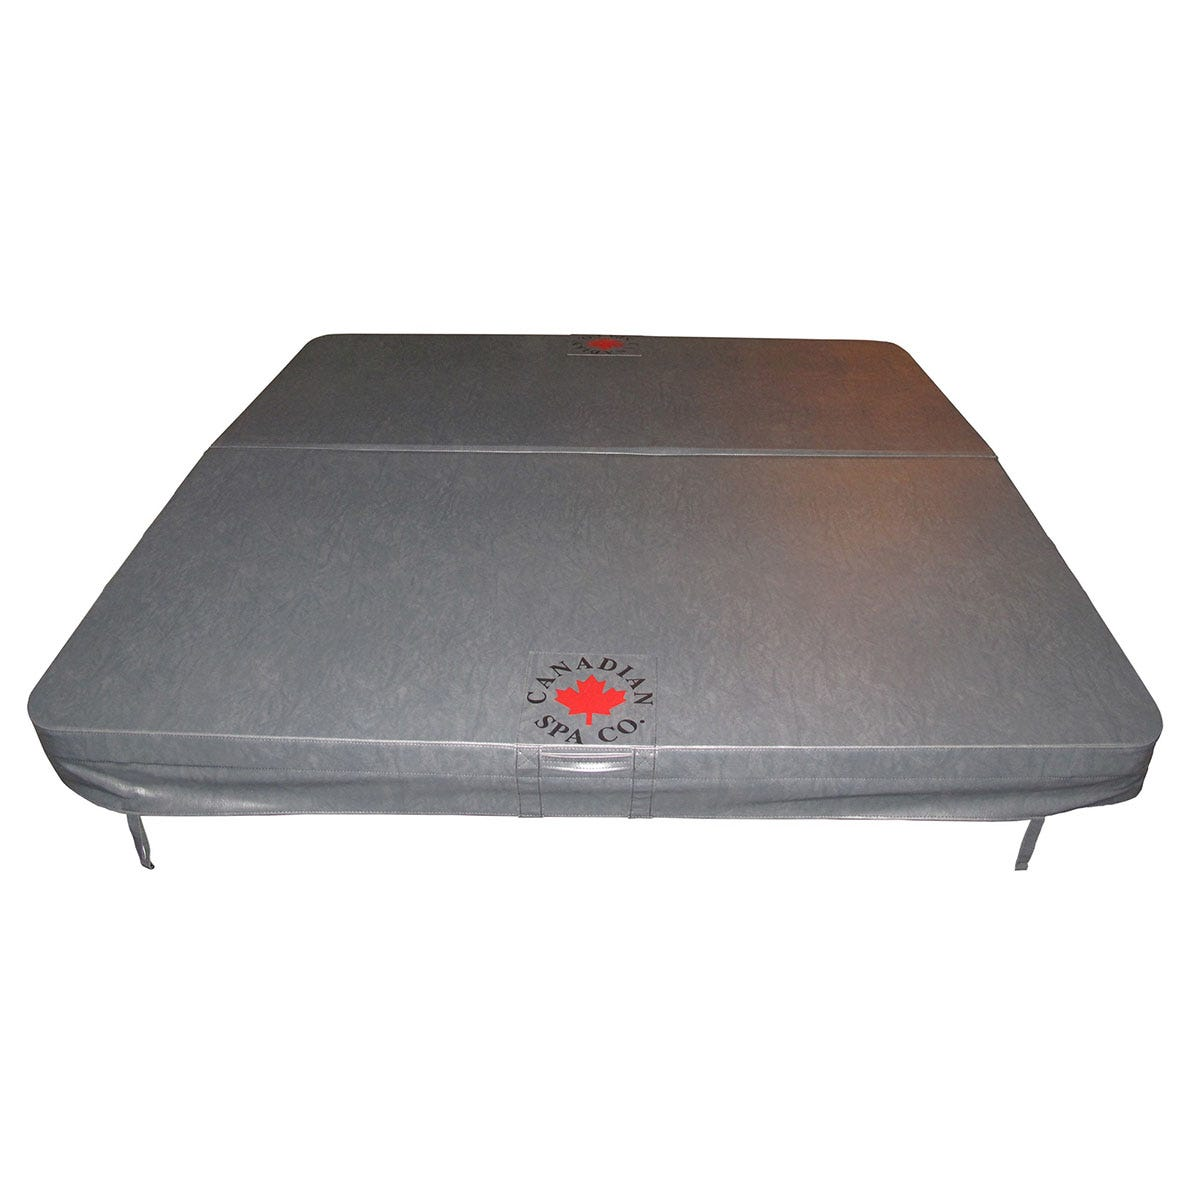 Canadian Spa Hot Tub Cover - Grey 203cm